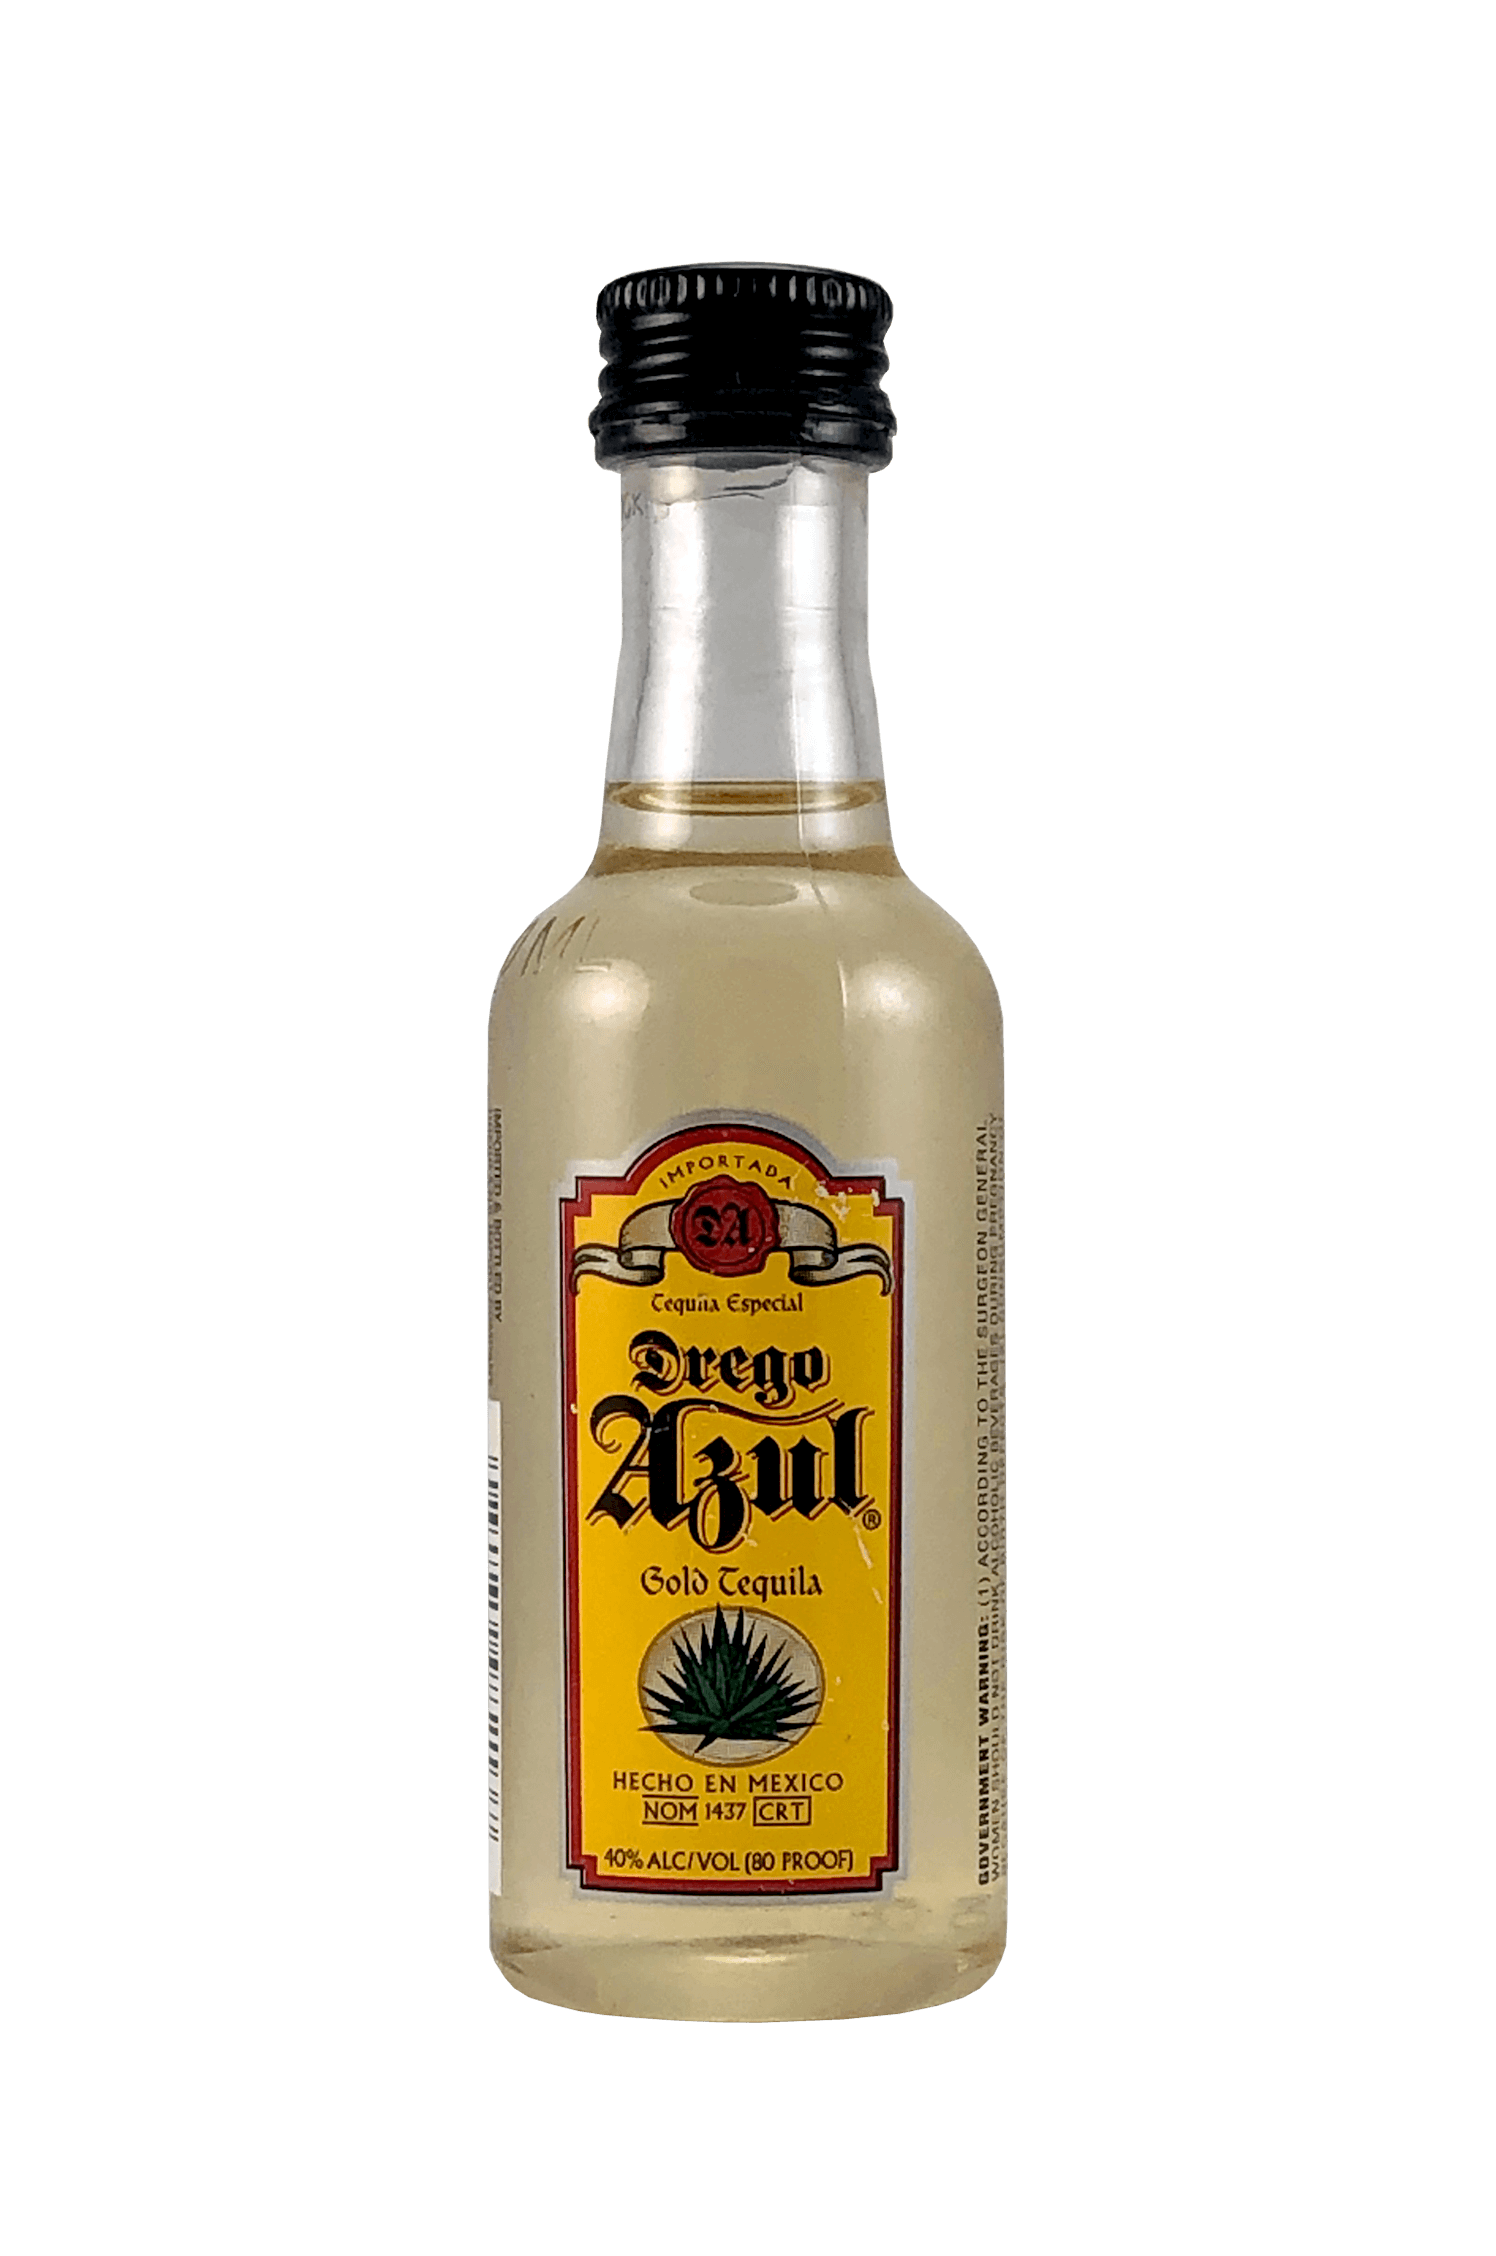 Drego Azul Gold Tequila